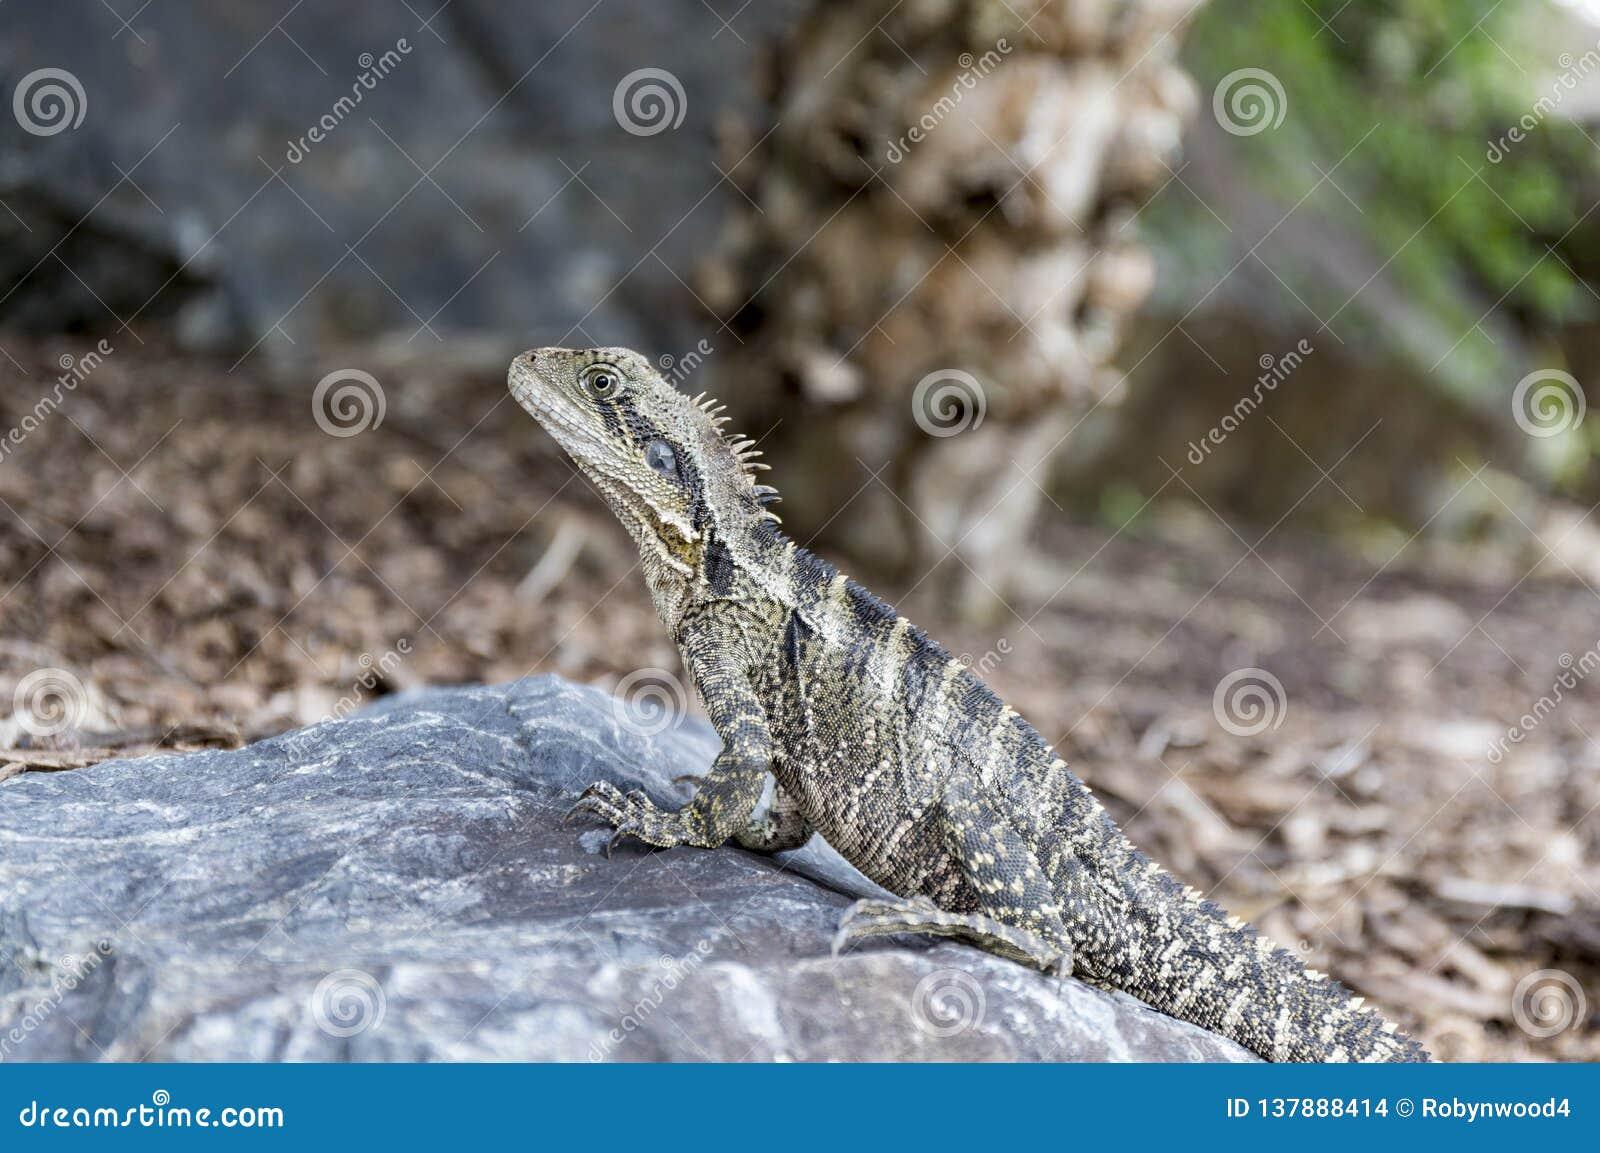 Australian water dragon sits on a rock, basking in the sun